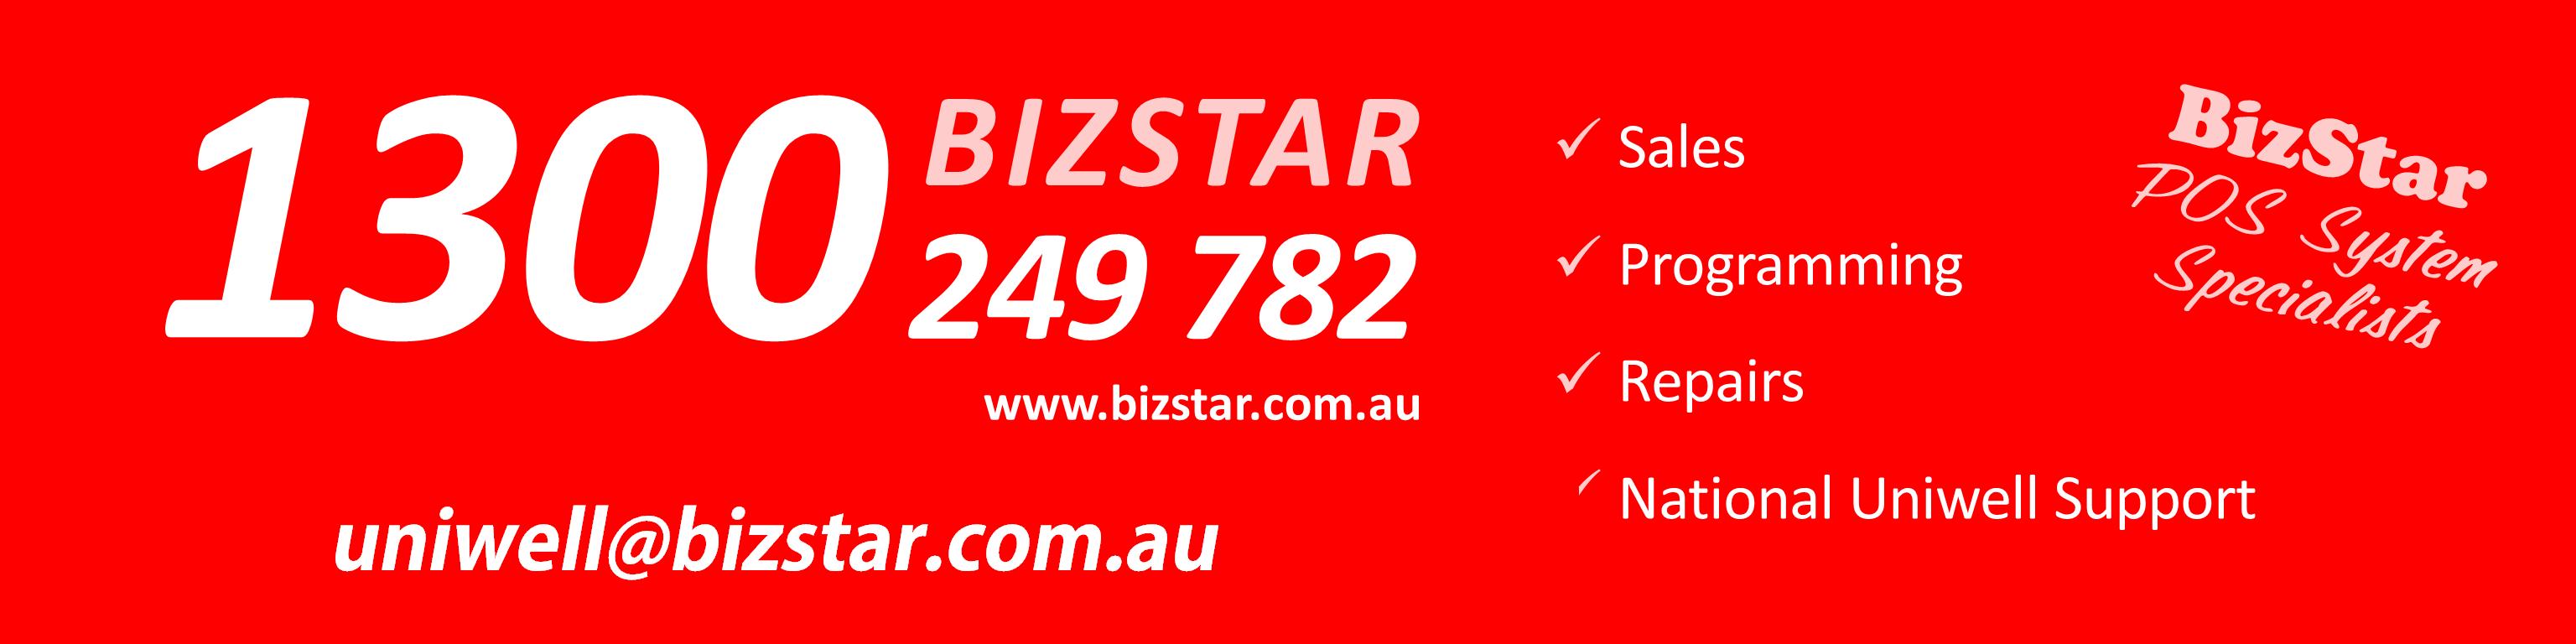 bizstar-banner-red